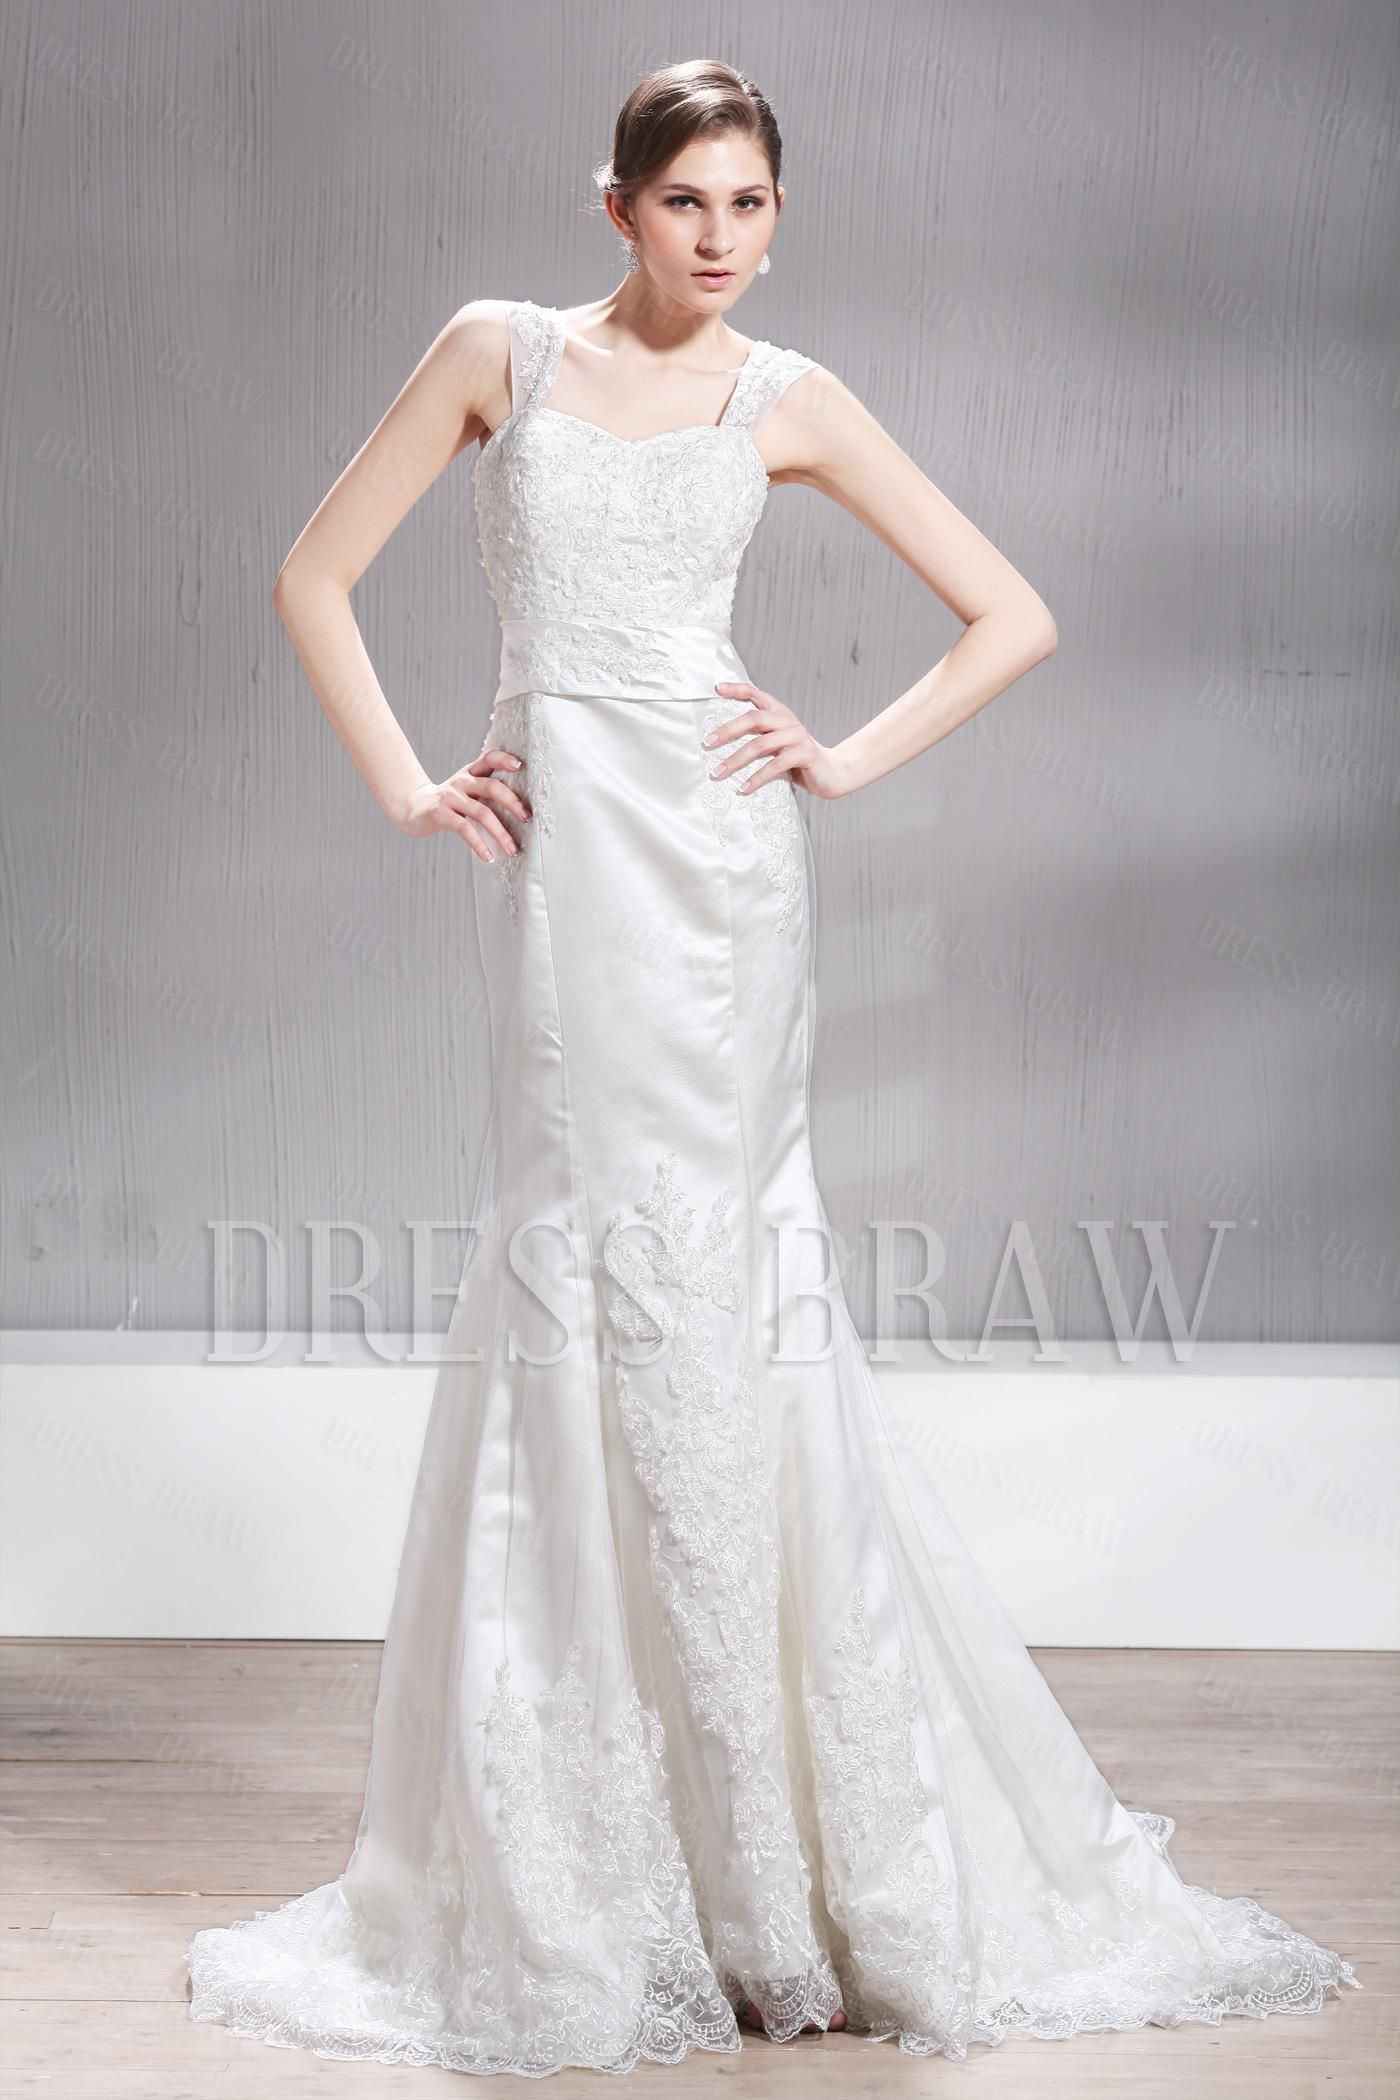 http://www.dressbraw.com/product/Gorgeous-Lace-Mermaid-Trumpet-Sweetheart-Straps-Chapel-Patricias-Wedding-Dresses-7913403.html#